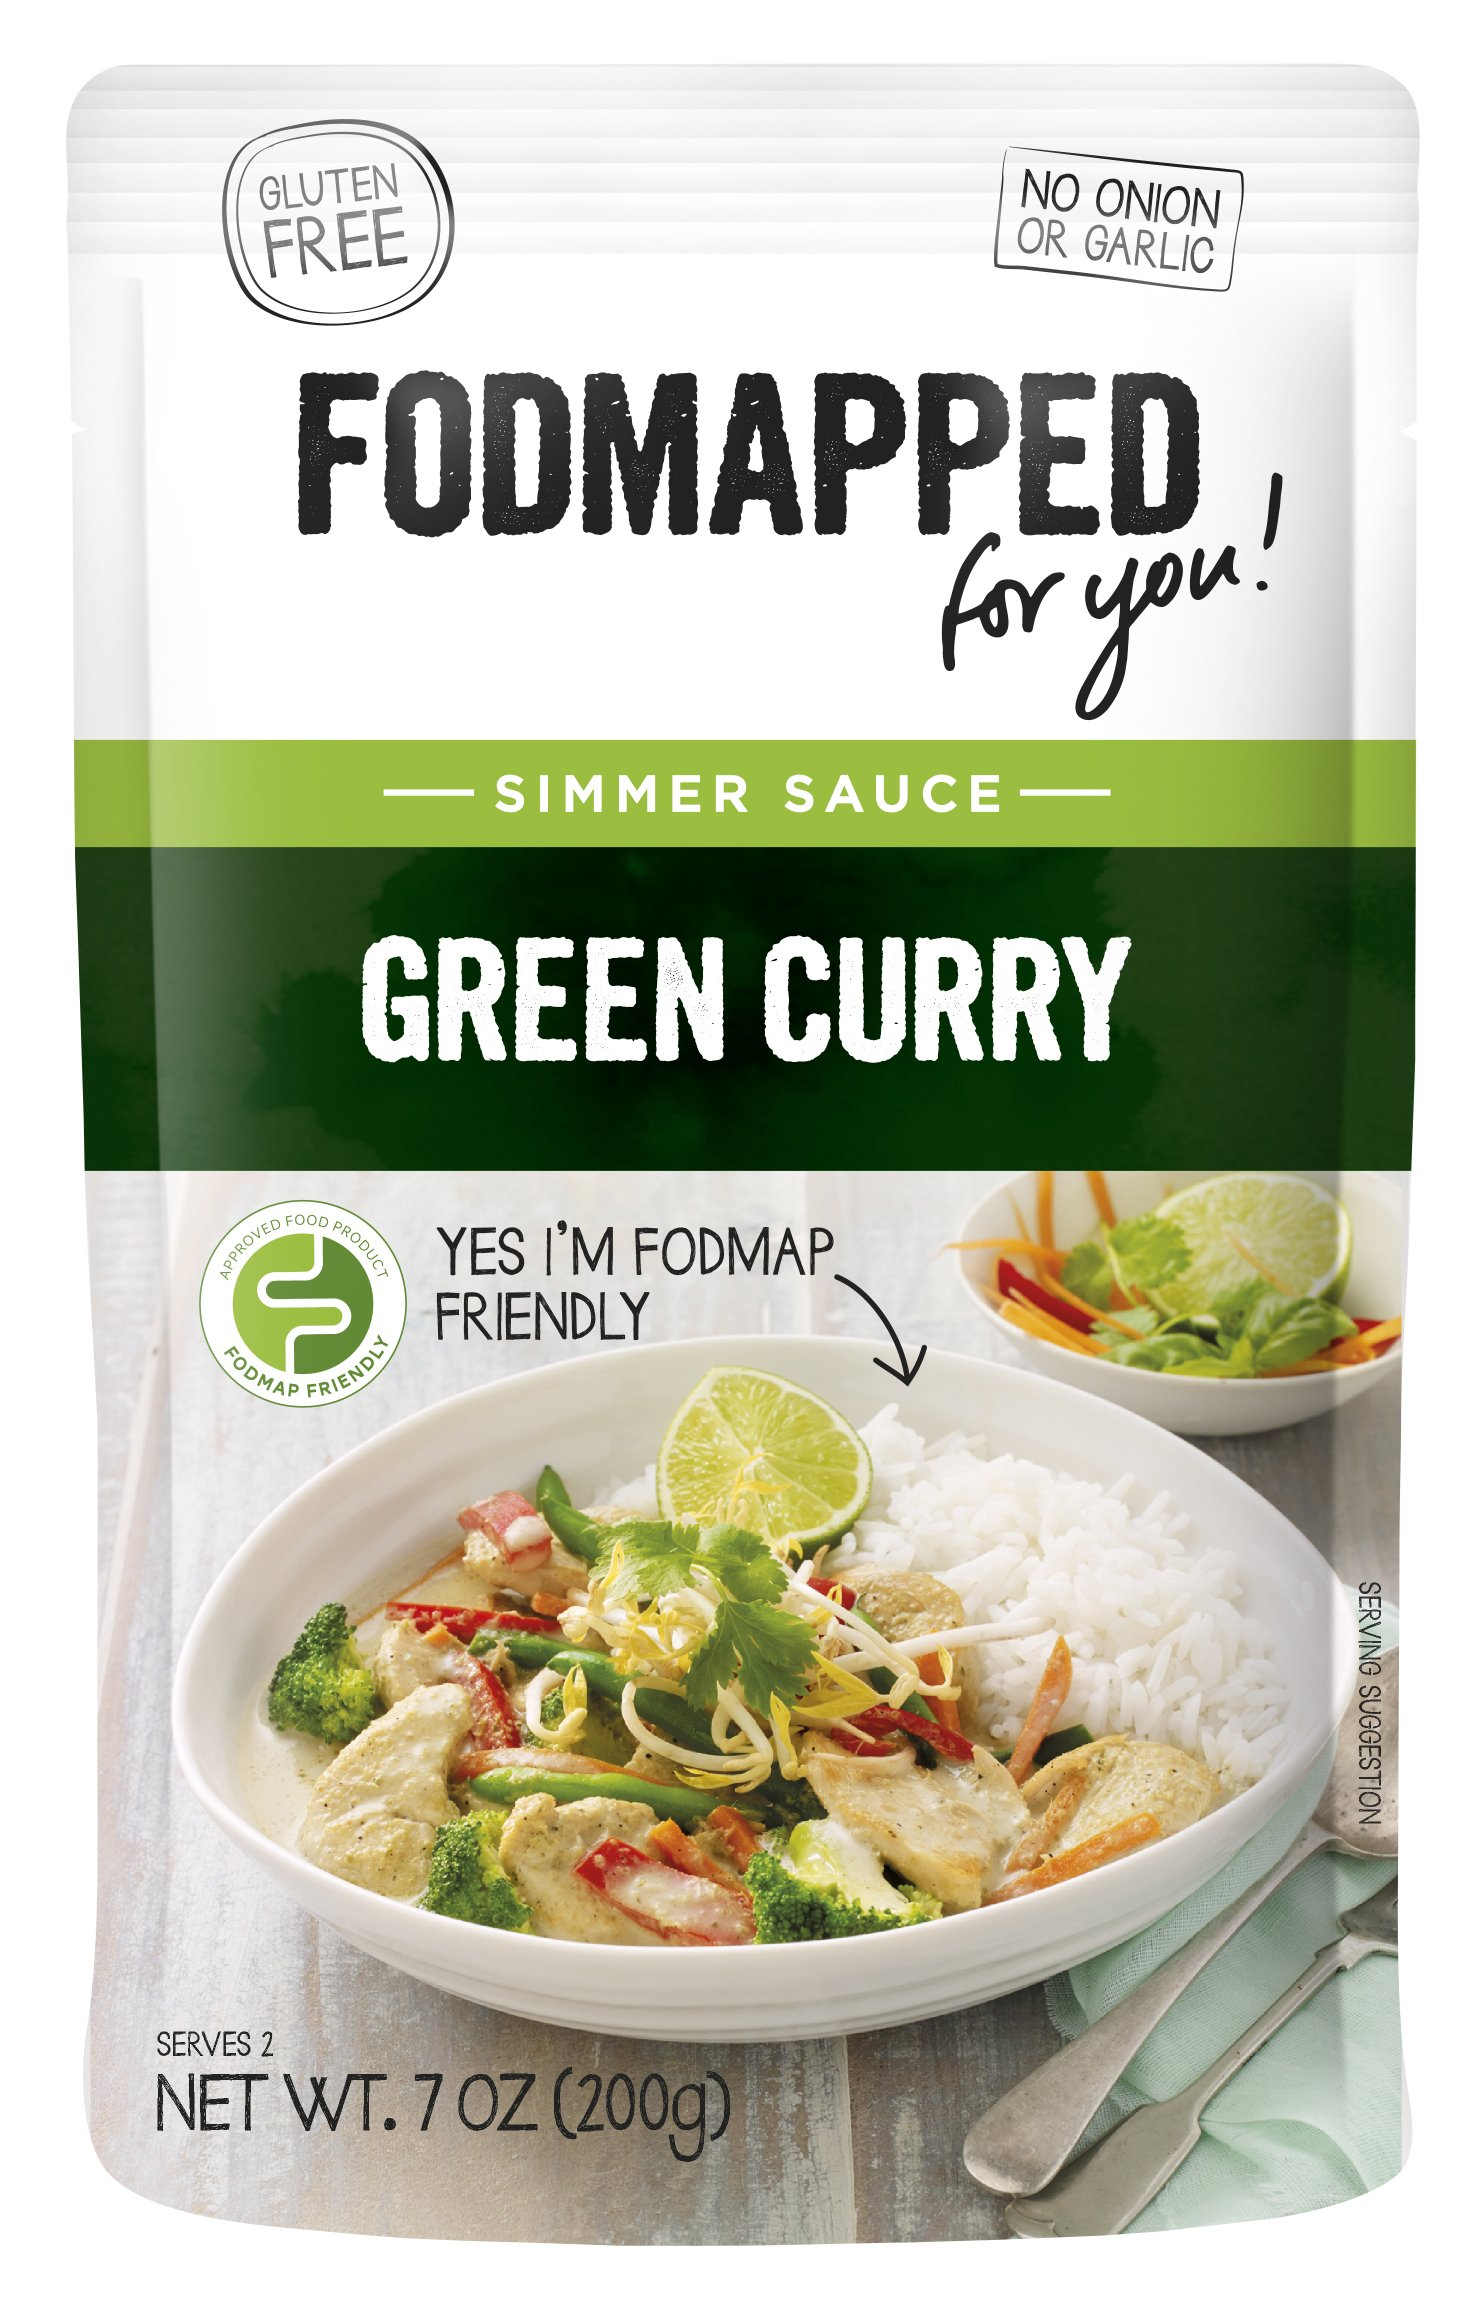 FODMAPPED - Low FODMAP Green Curry Simmer Sauce 7 OZ (200g)